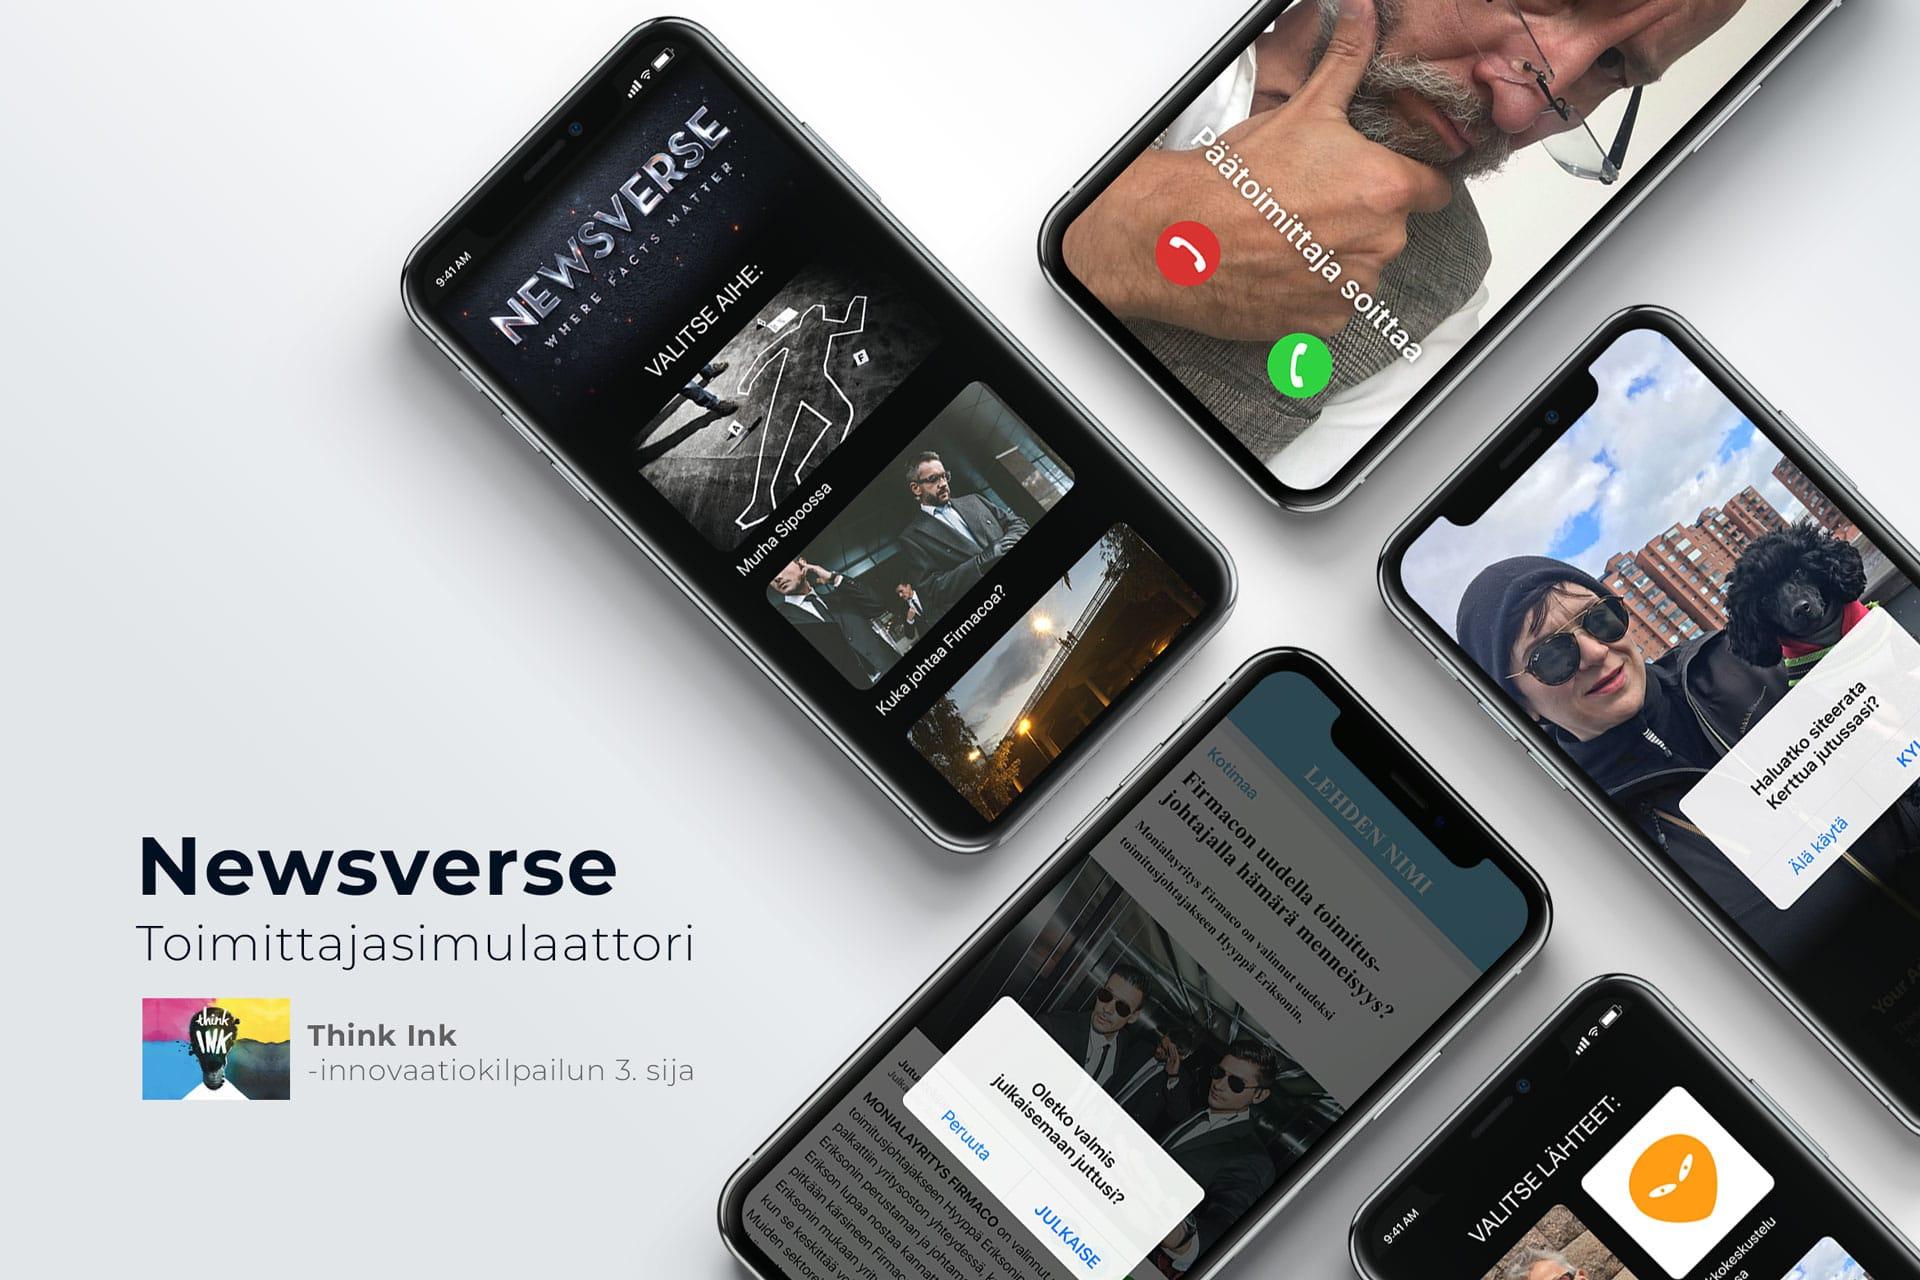 Newsverse-tomittajasimulaattori – uusi mobiili oppimisalusta